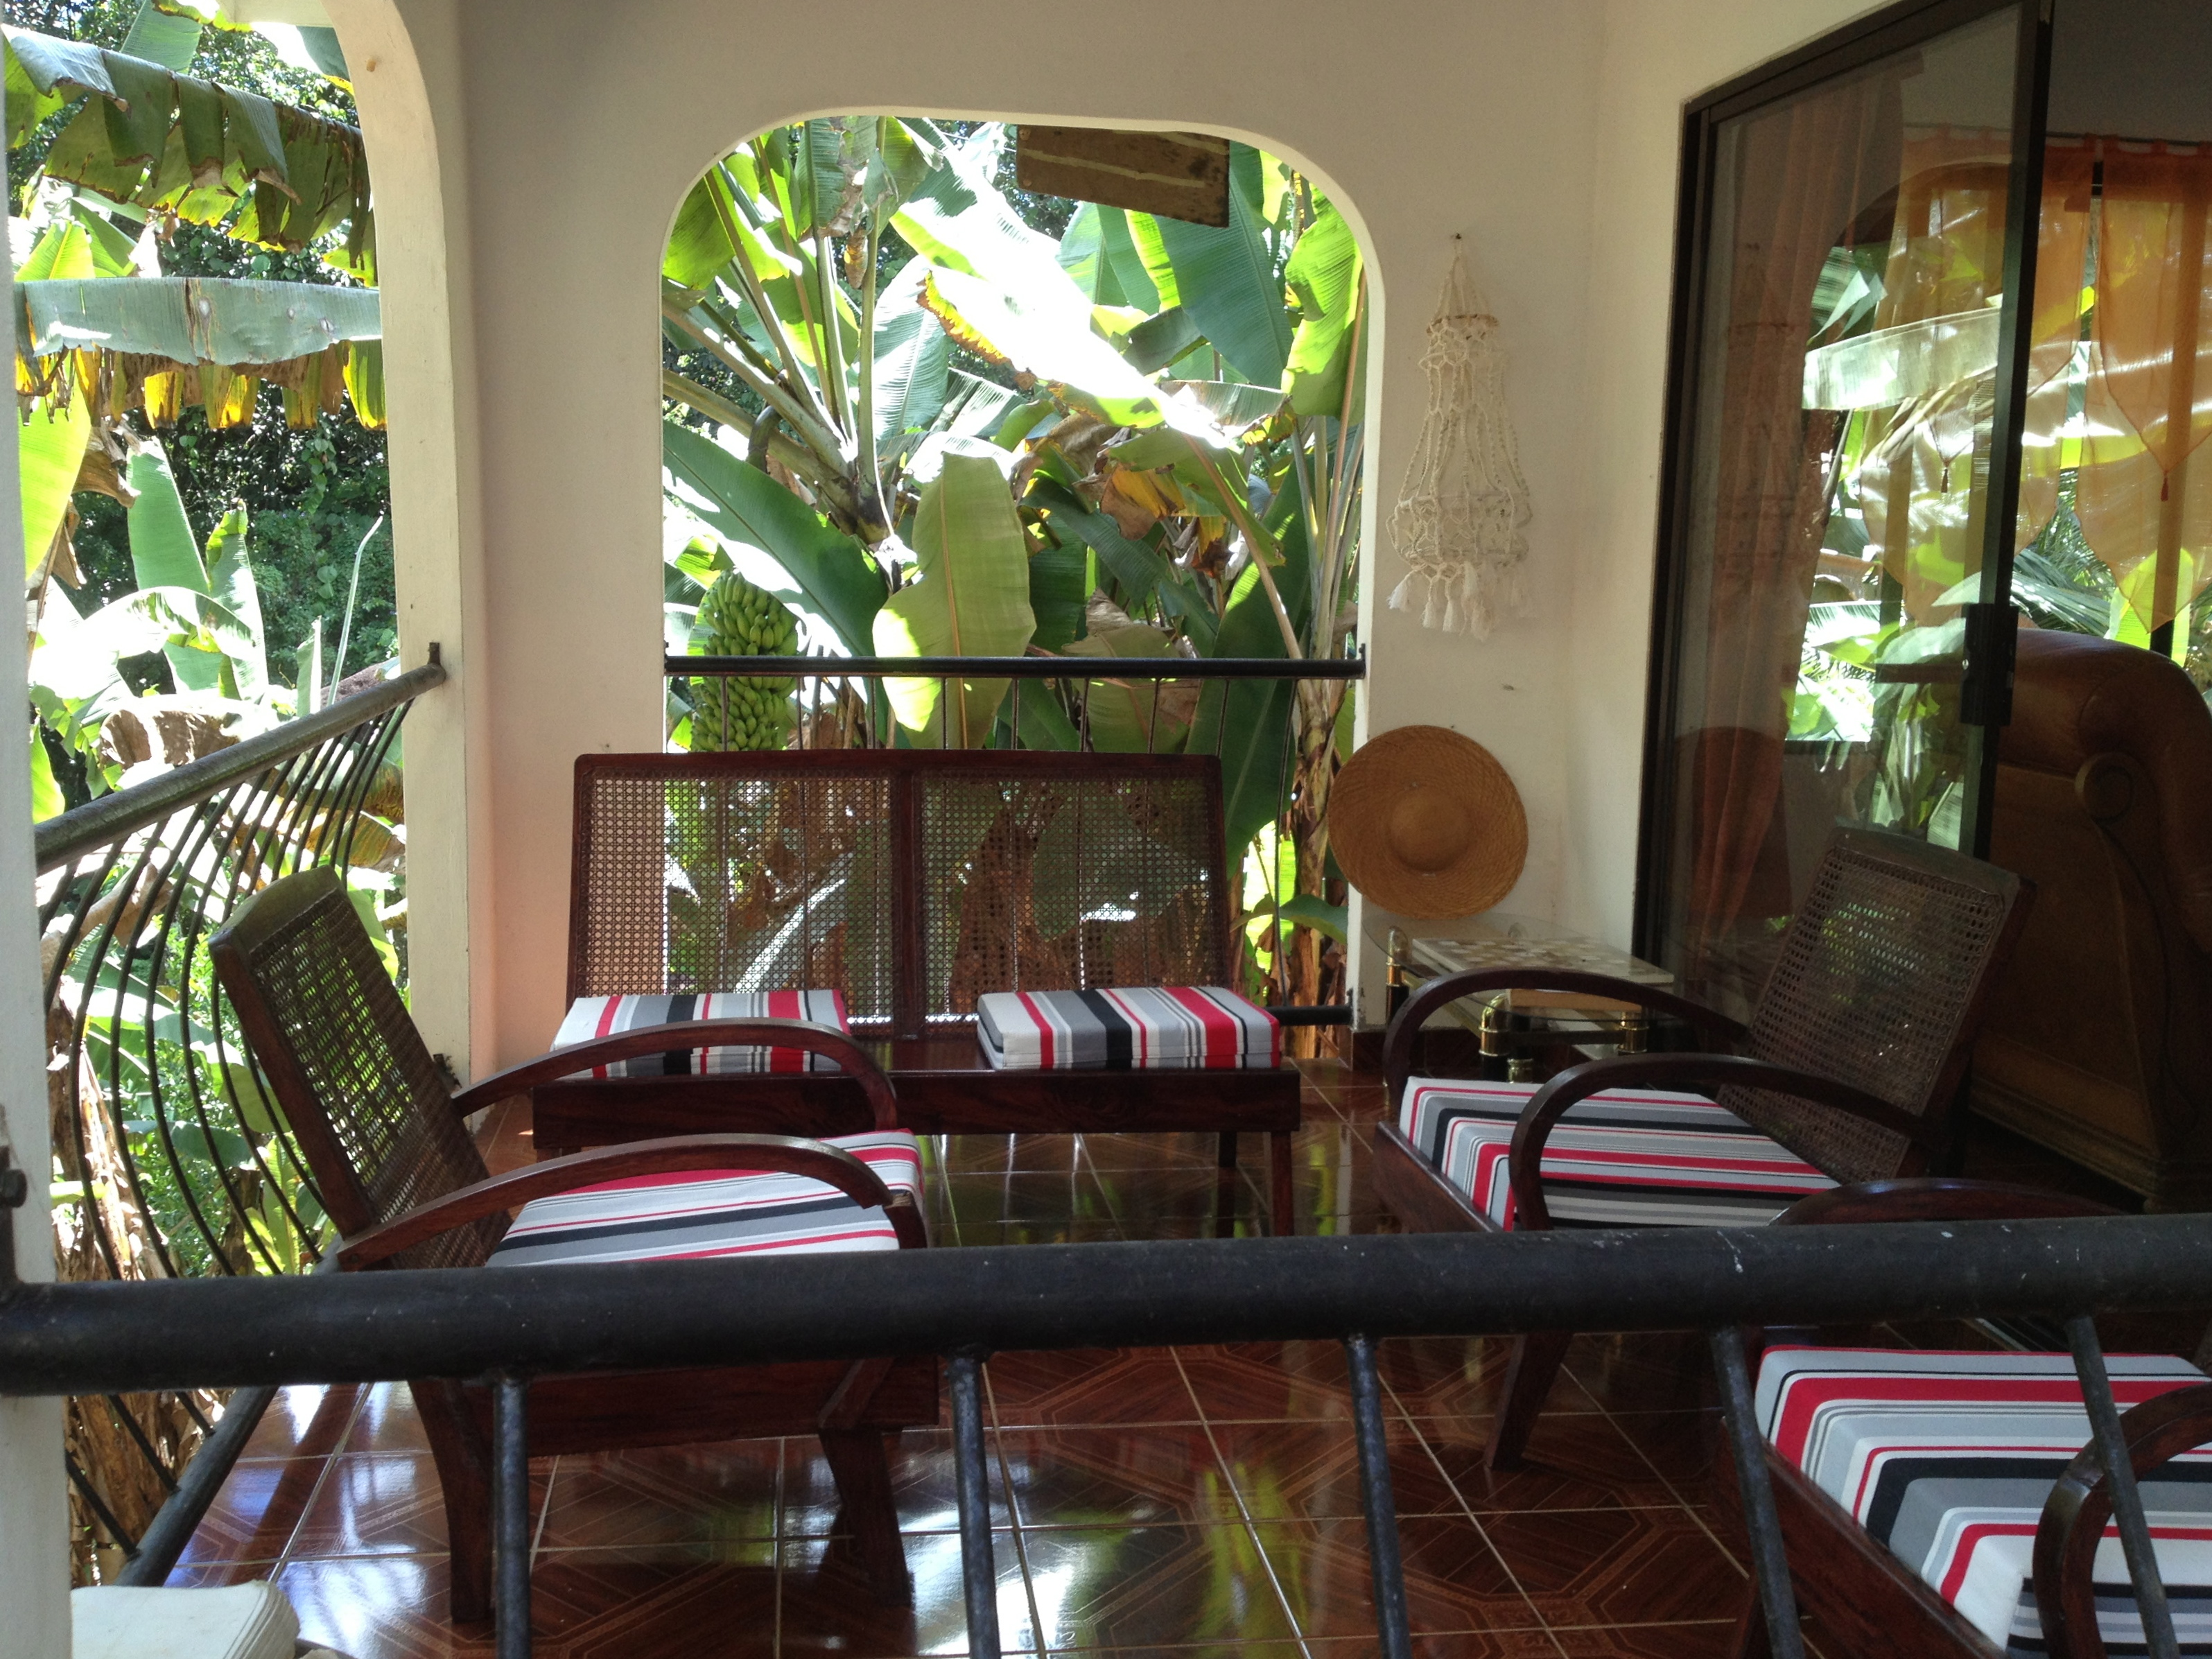 Papaya seychelles guesthouse Veranda